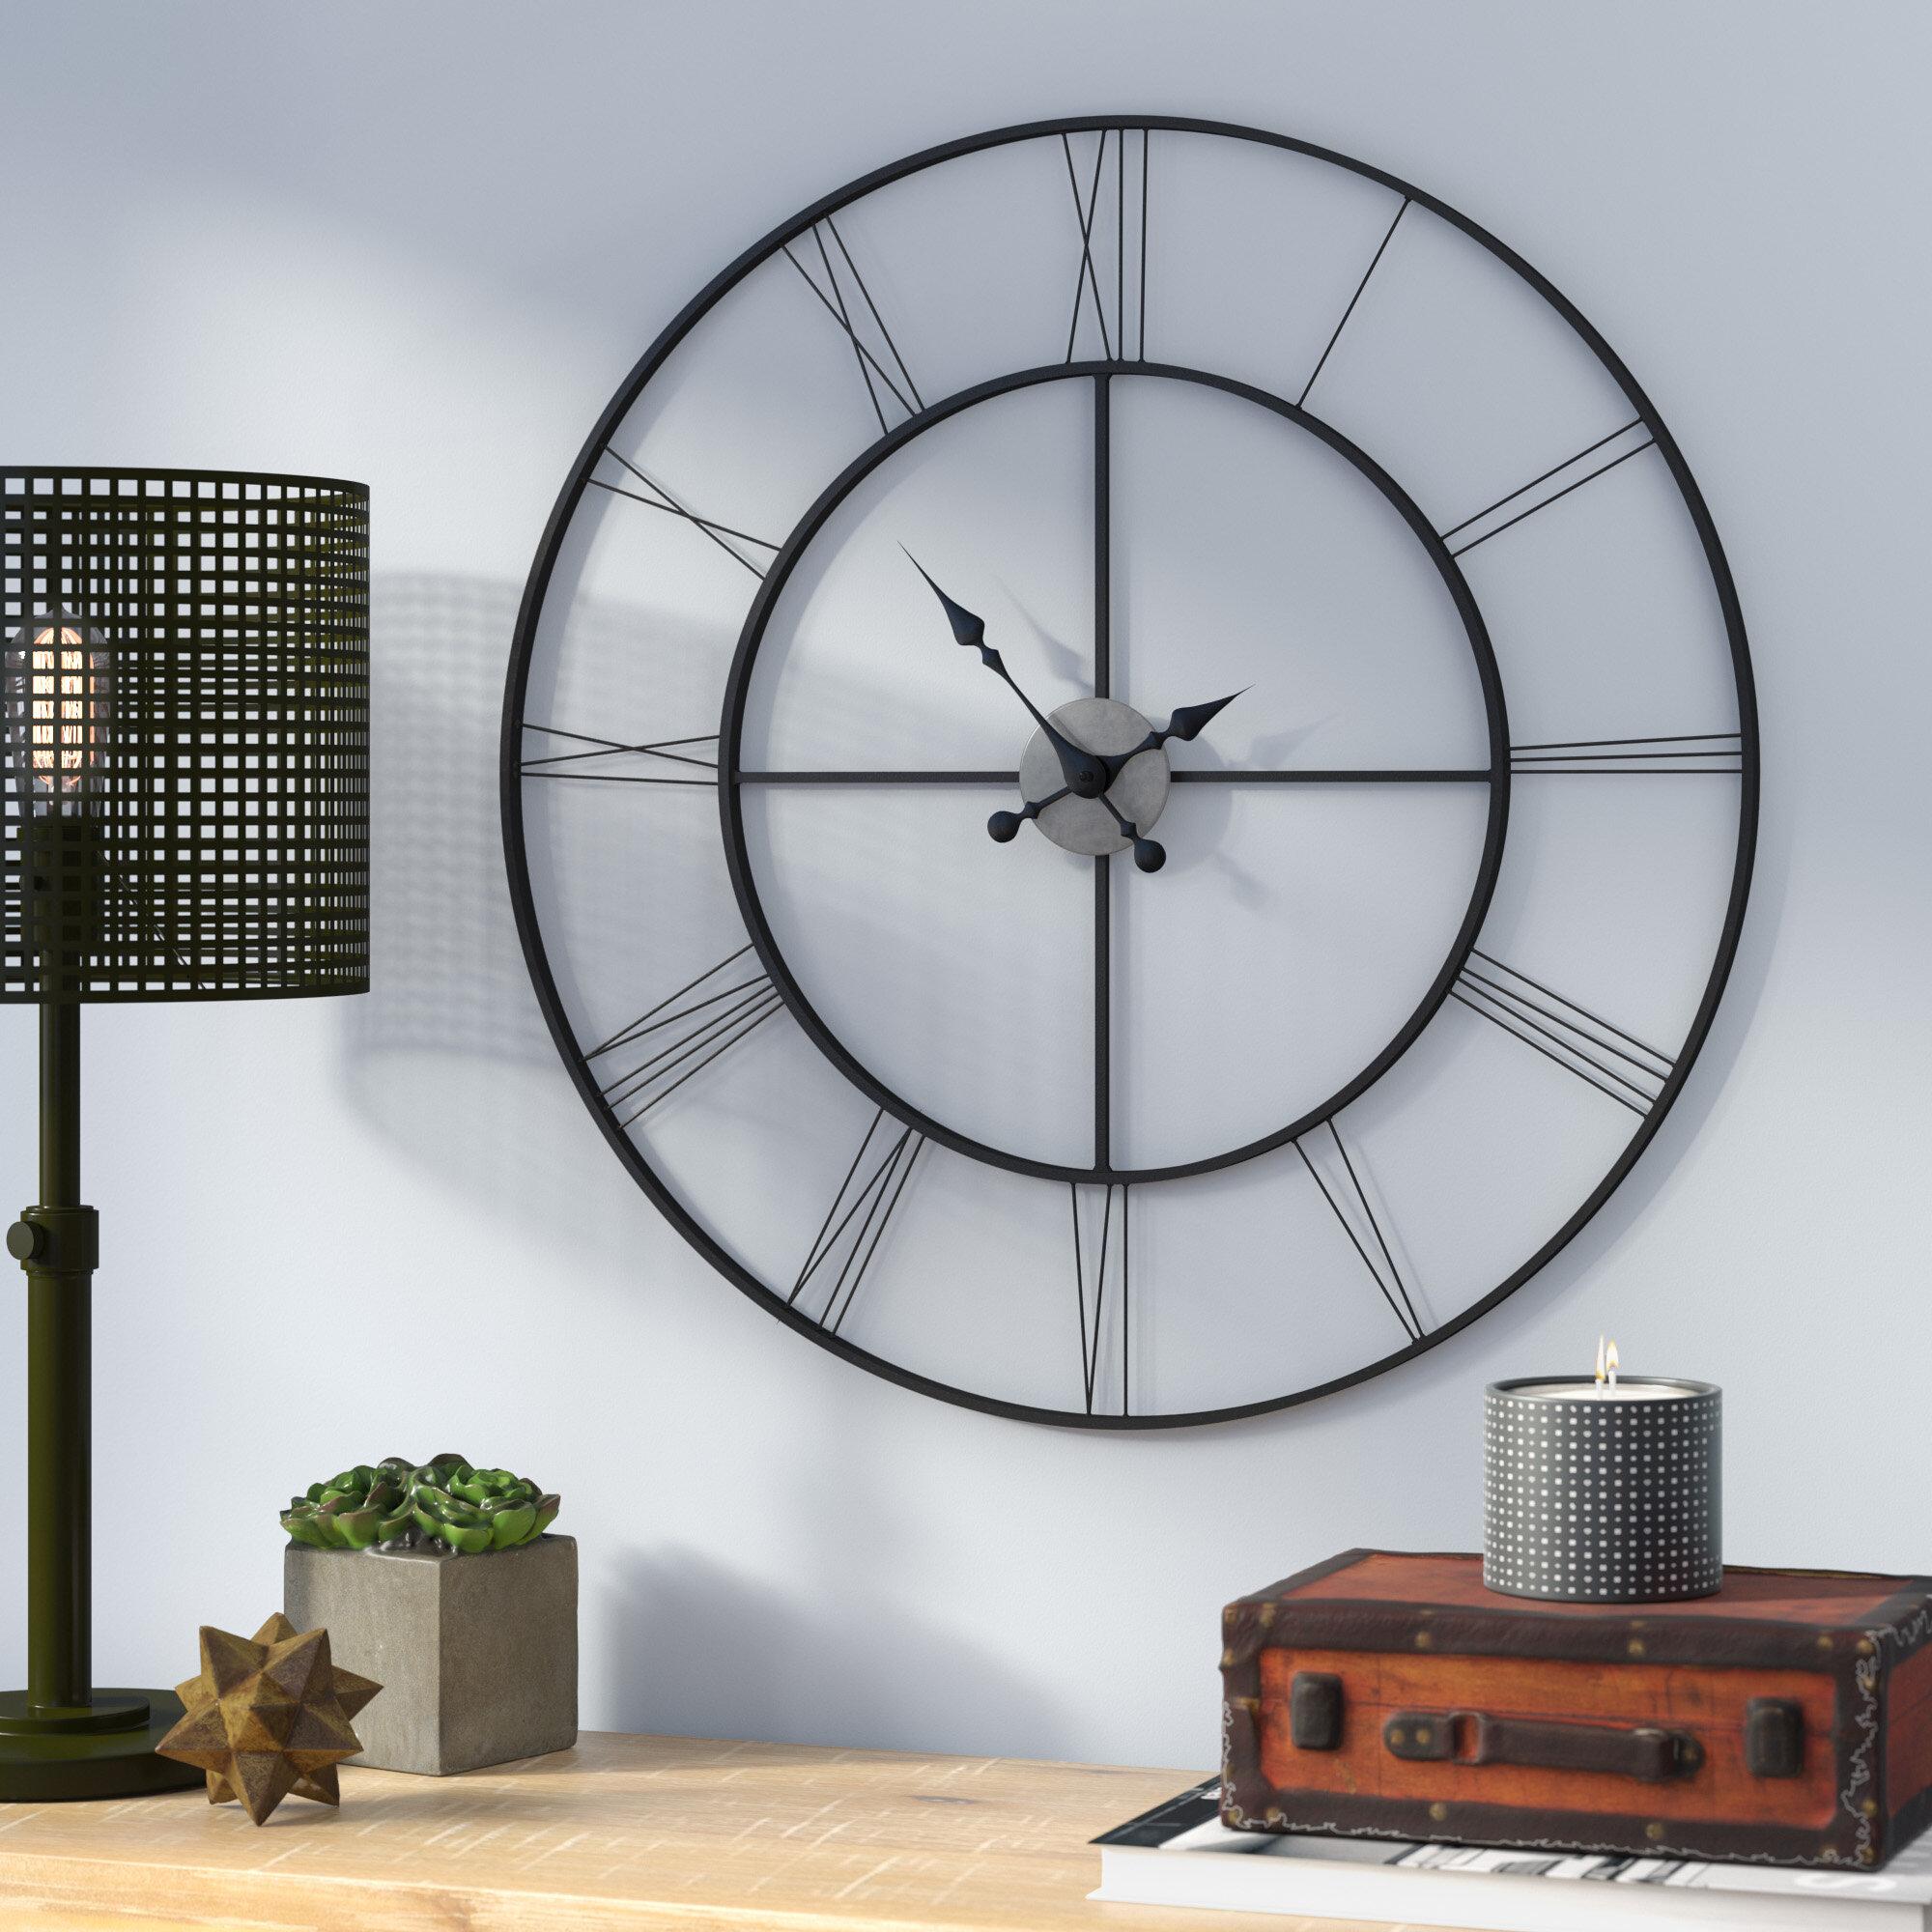 Laurel Foundry Modern Farmhouse Oversized Decorative 30 5 Wall Clock Reviews Wayfair